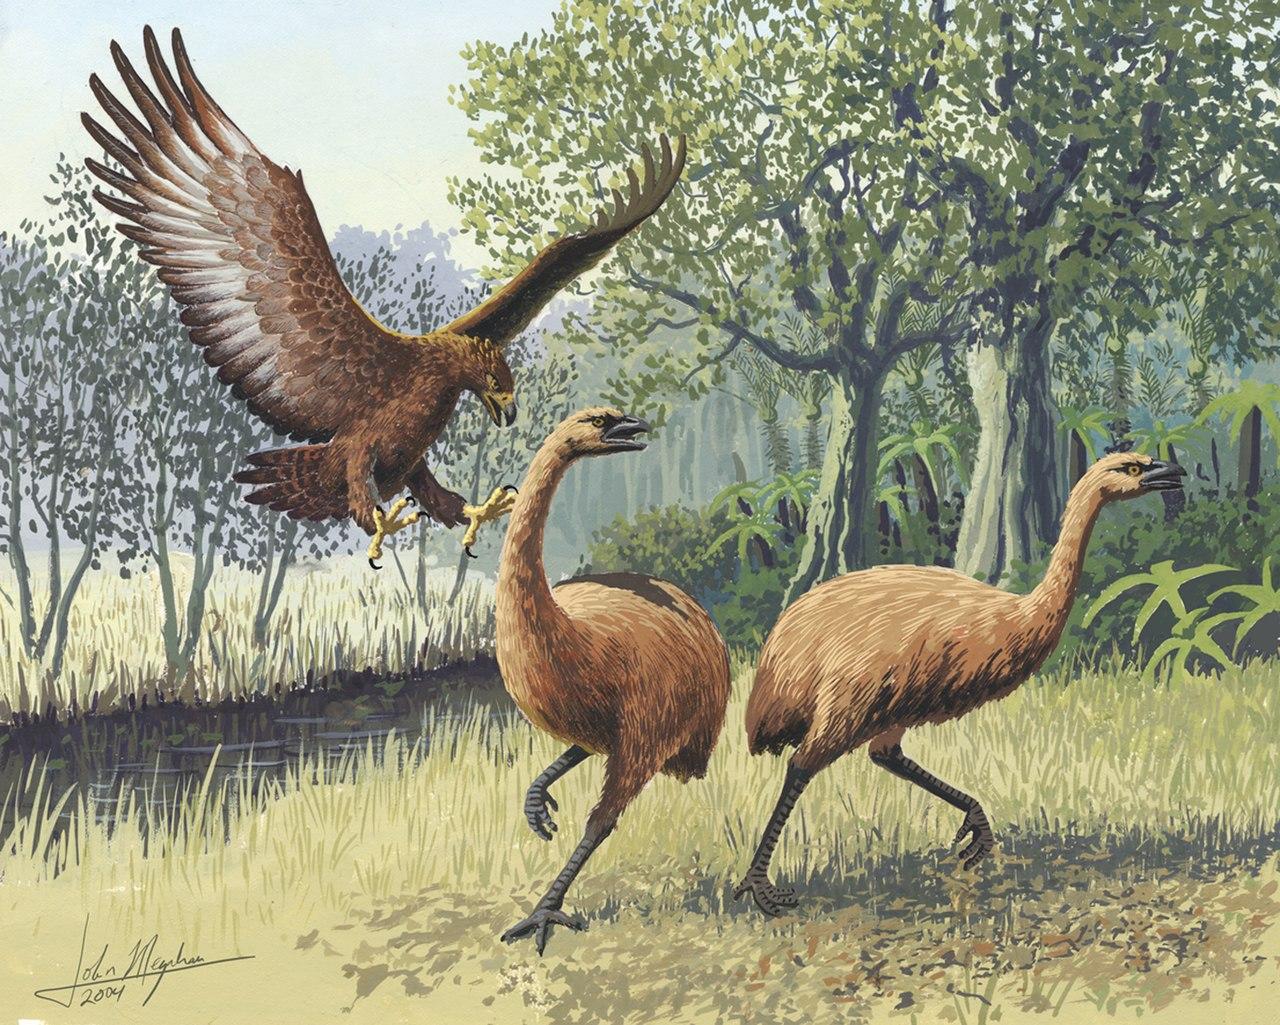 extinction facts 2022 late devonian extinction facts facts about mass extinction extinction the facts bbc america